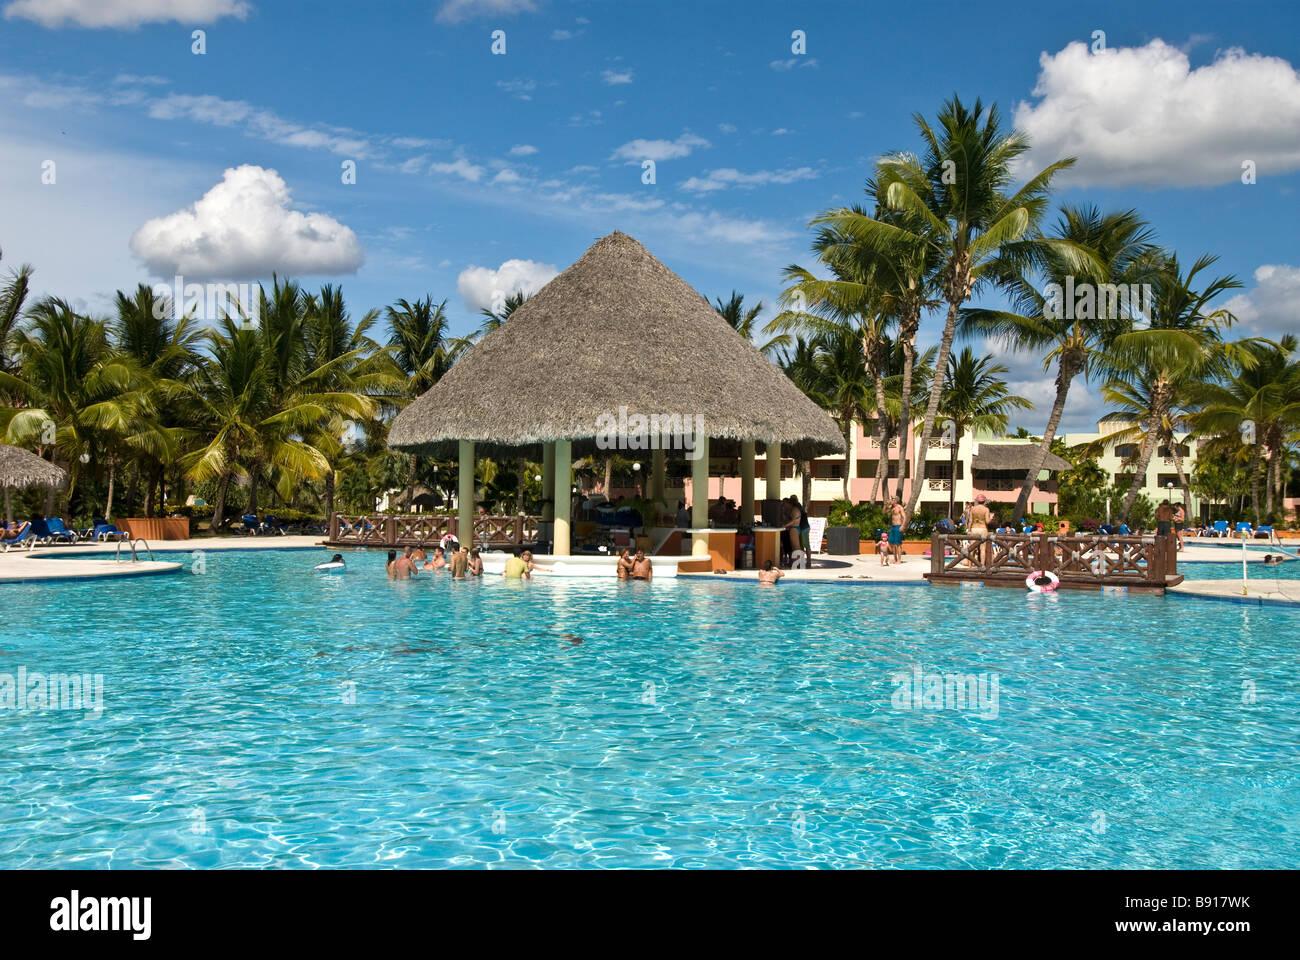 Tropical Island Lodge Bilder